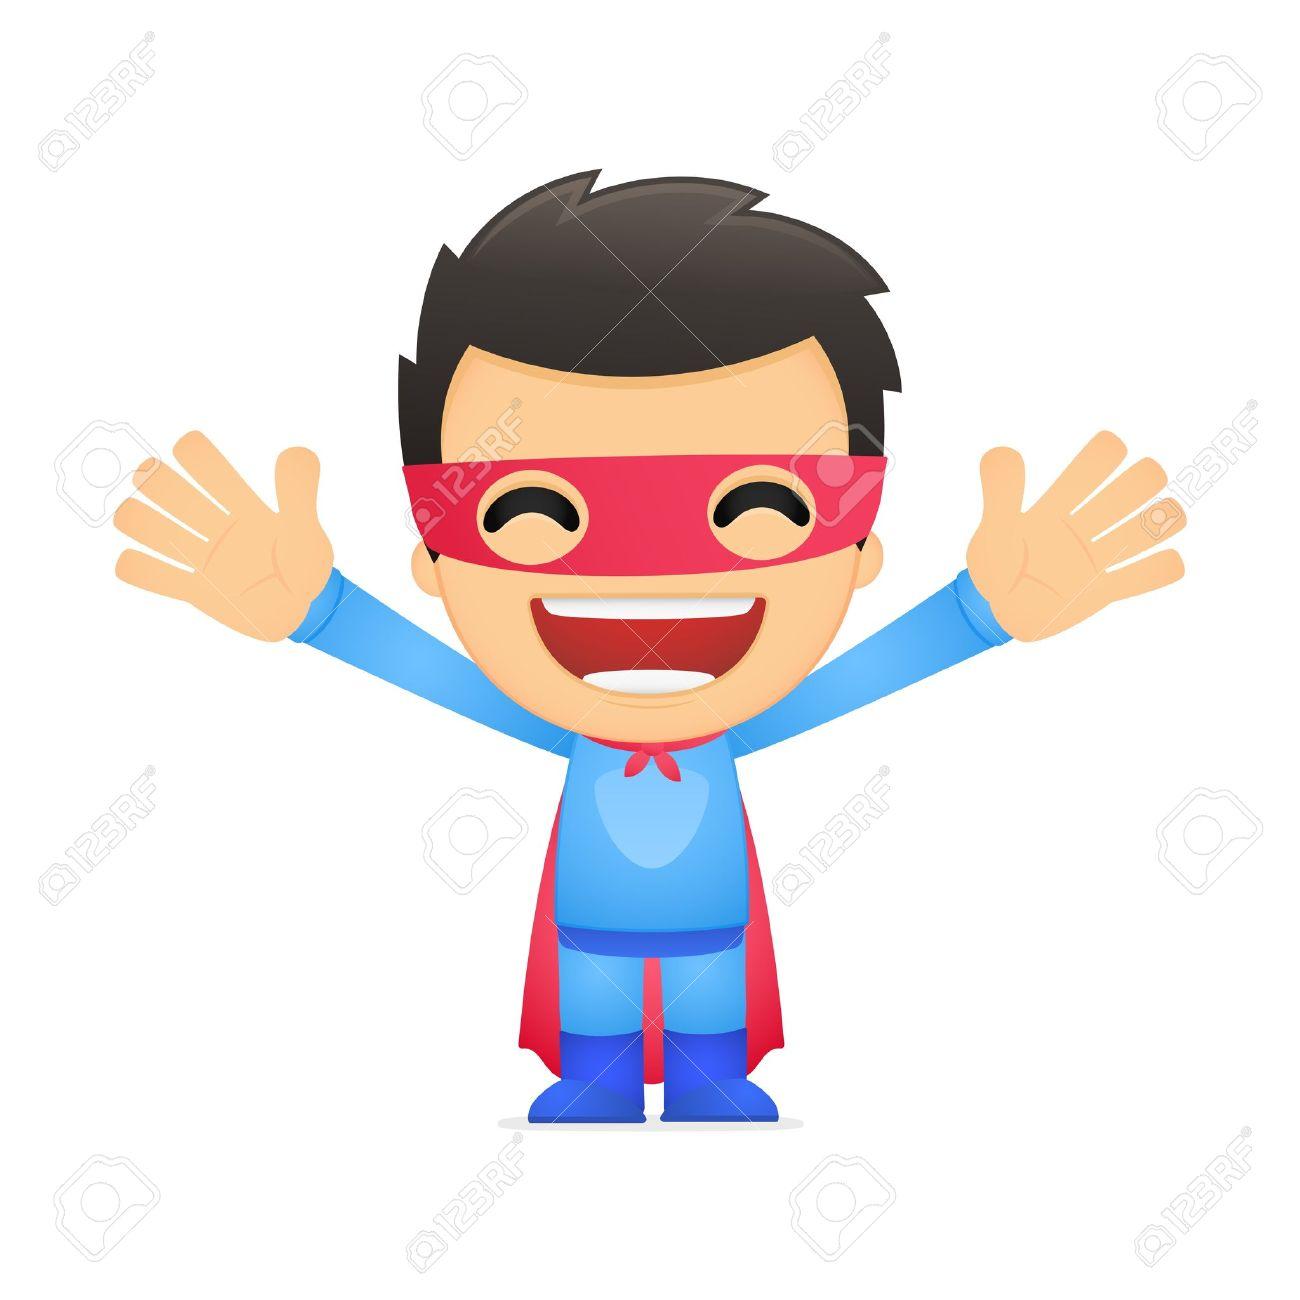 funny cartoon superhero Stock Vector - 13890204